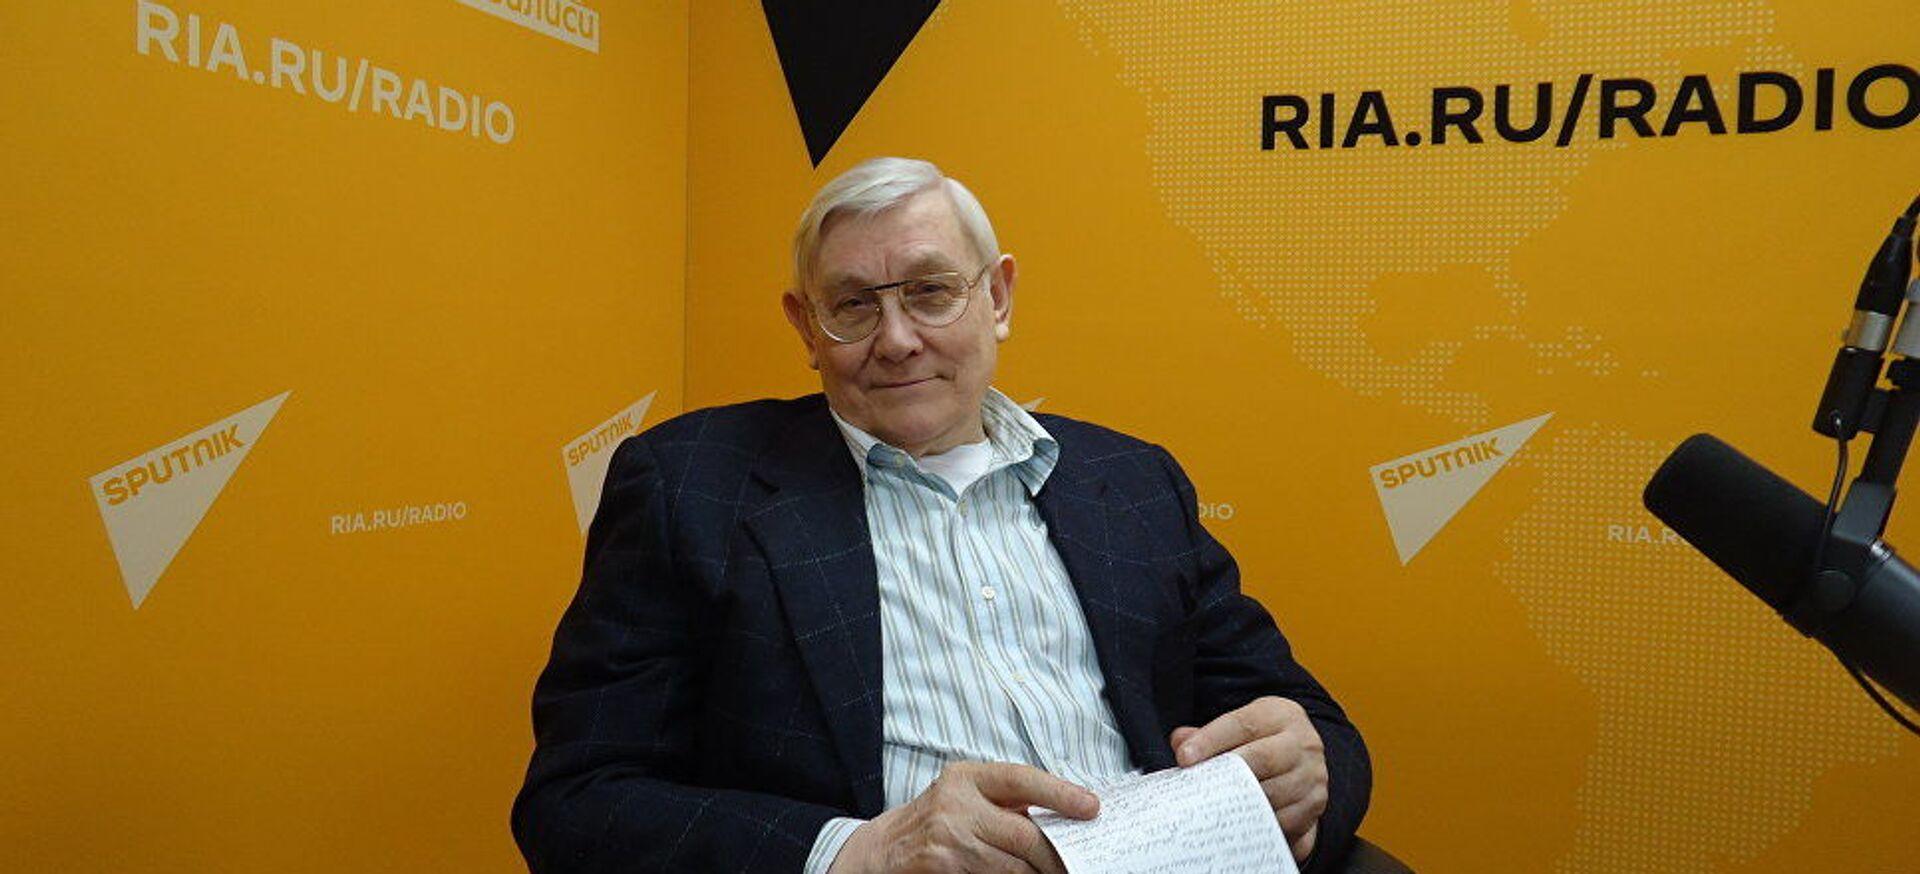 Американист Дмитрий Михеев - Sputnik Latvija, 1920, 04.07.2019